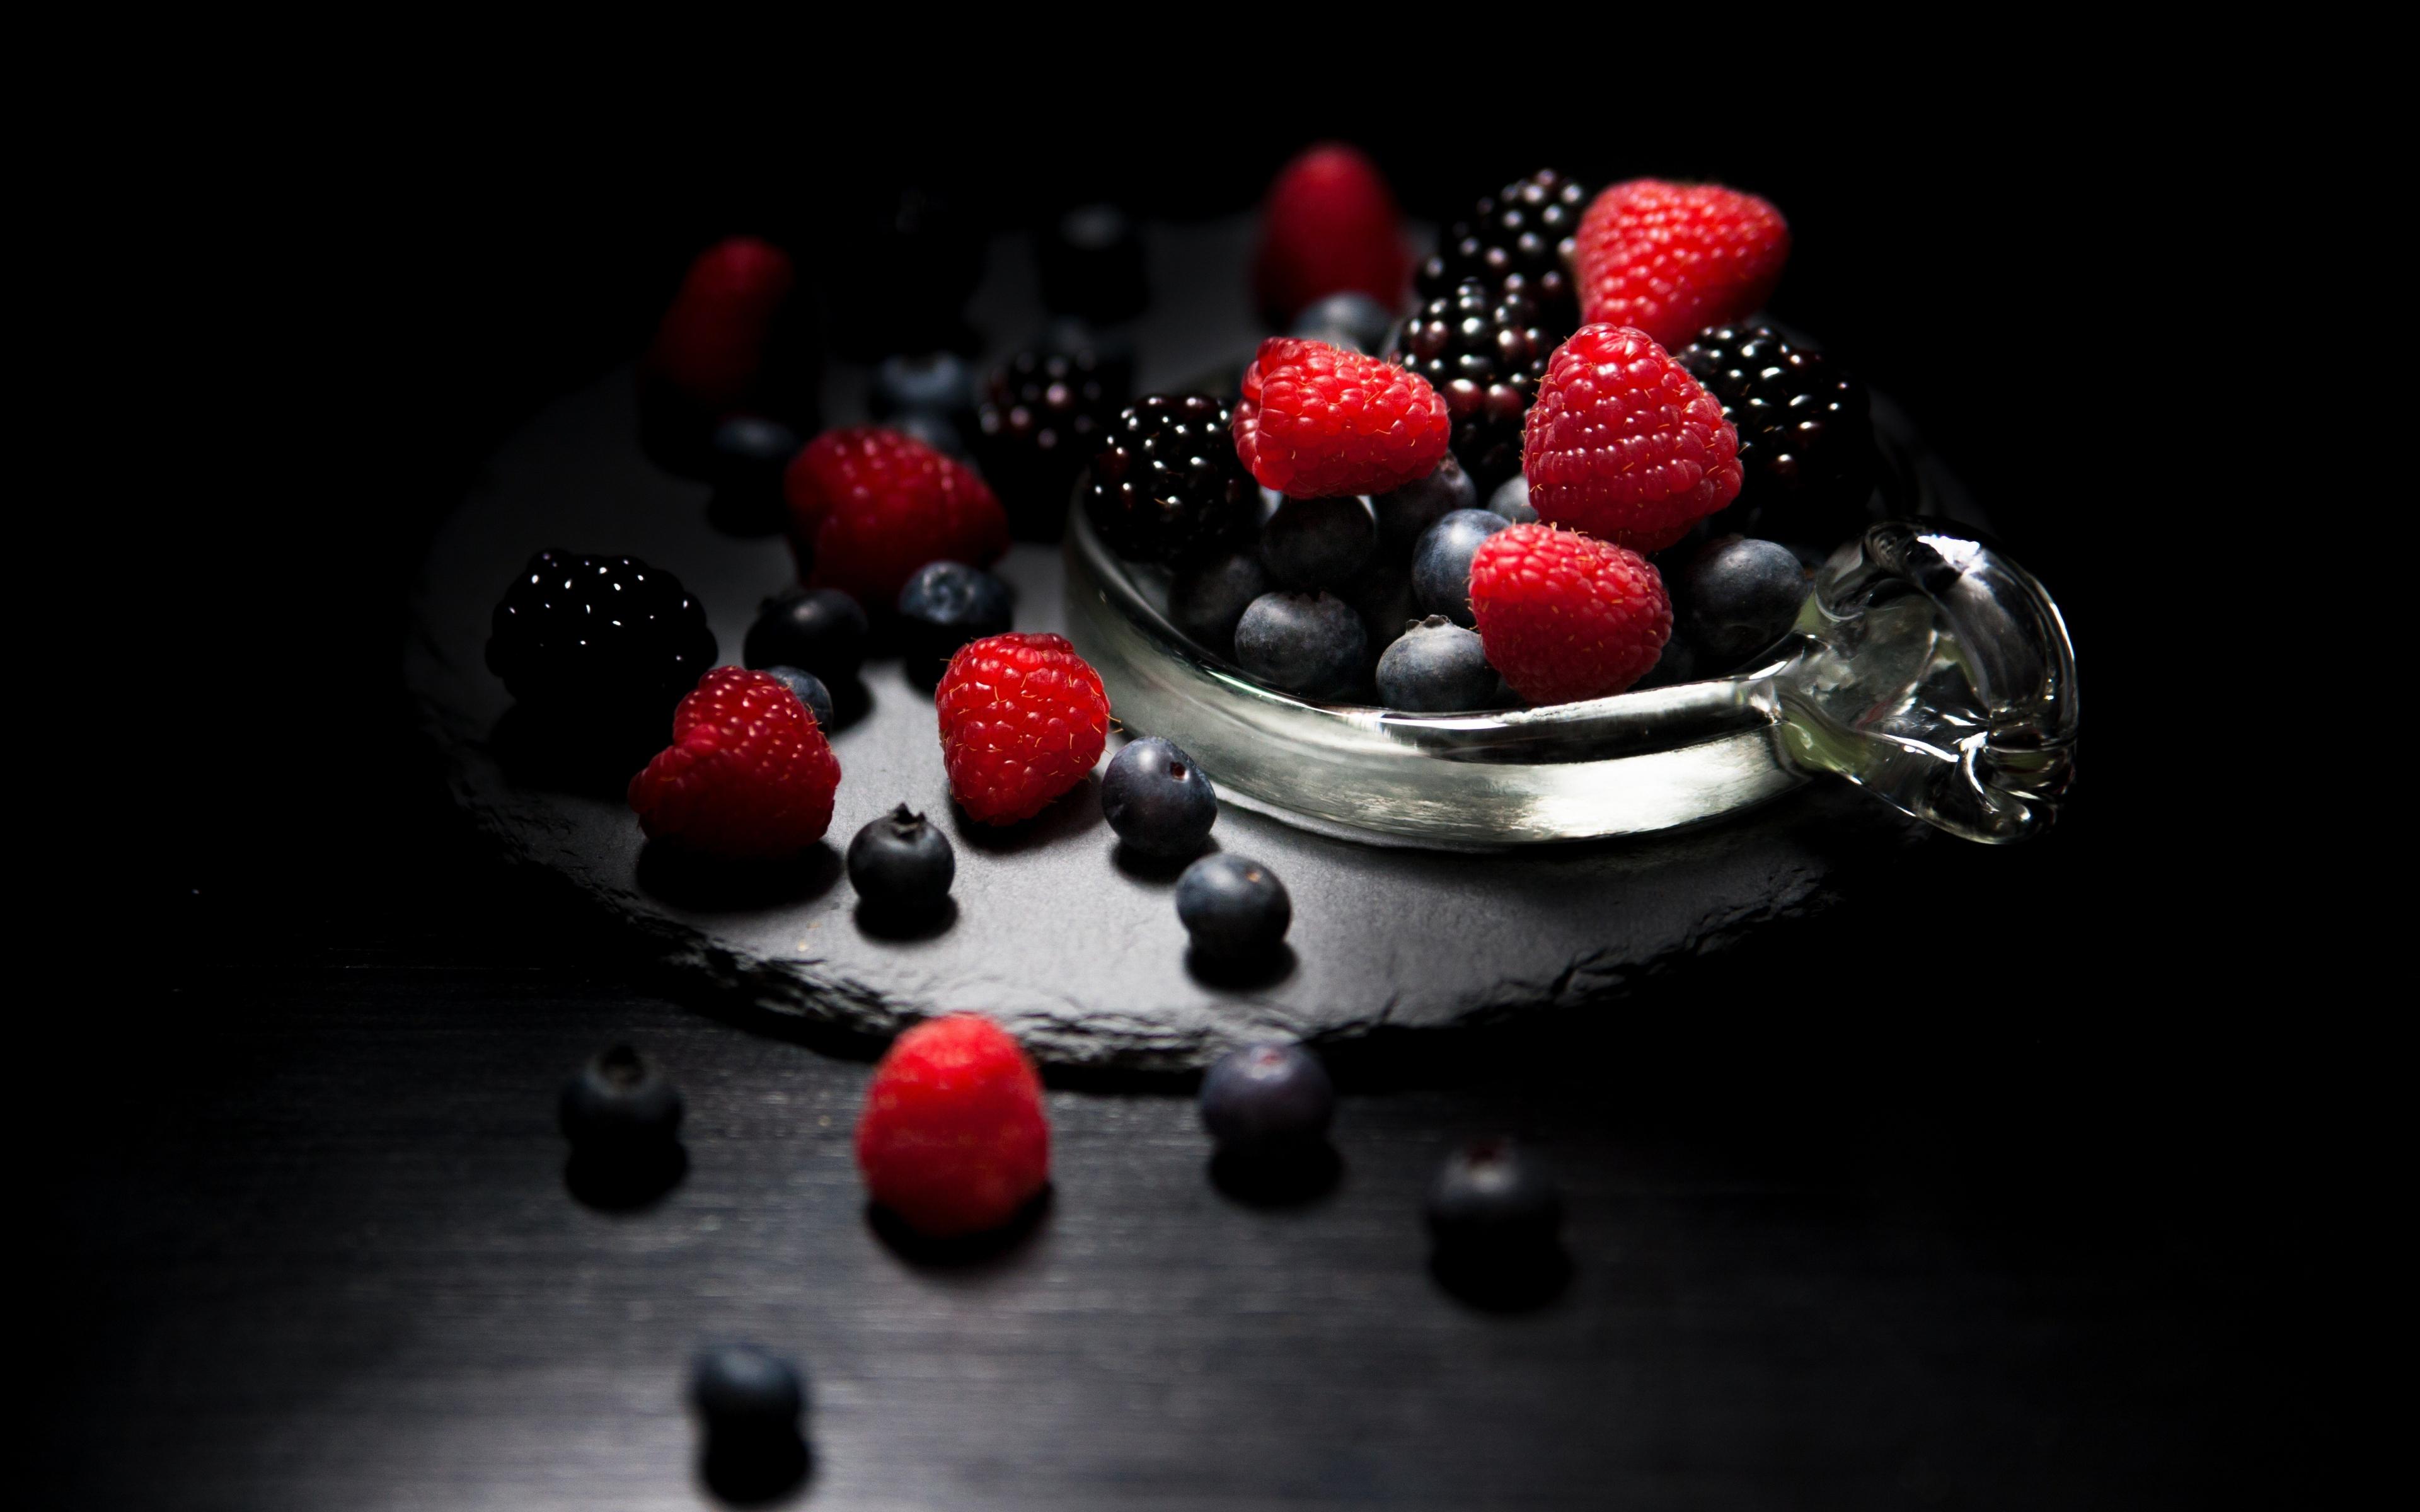 3840x2400 wallpaper Dark mood, food, fruits, blueberry, raspberry, blackberry, 4k